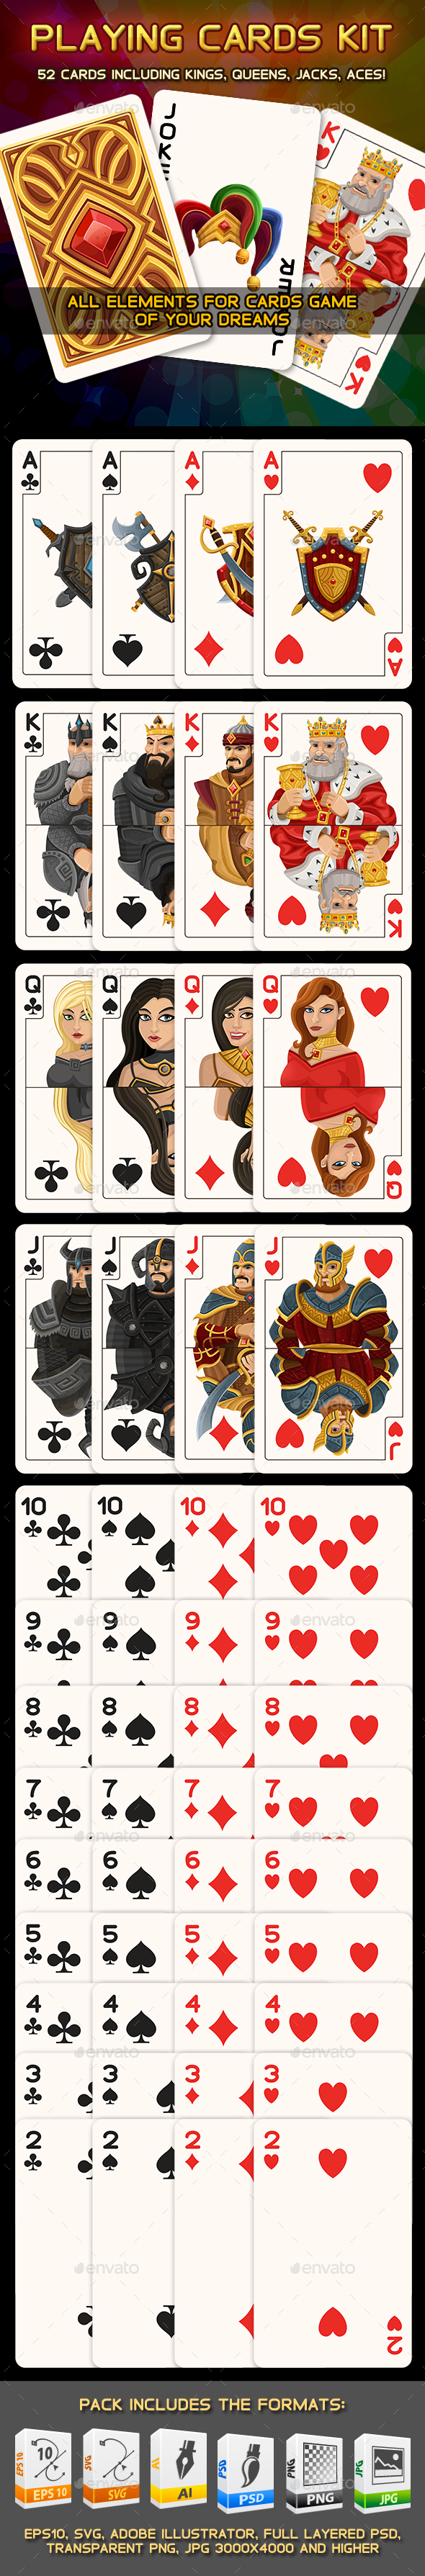 Playing Cards Kit - Game Kits Game Assets